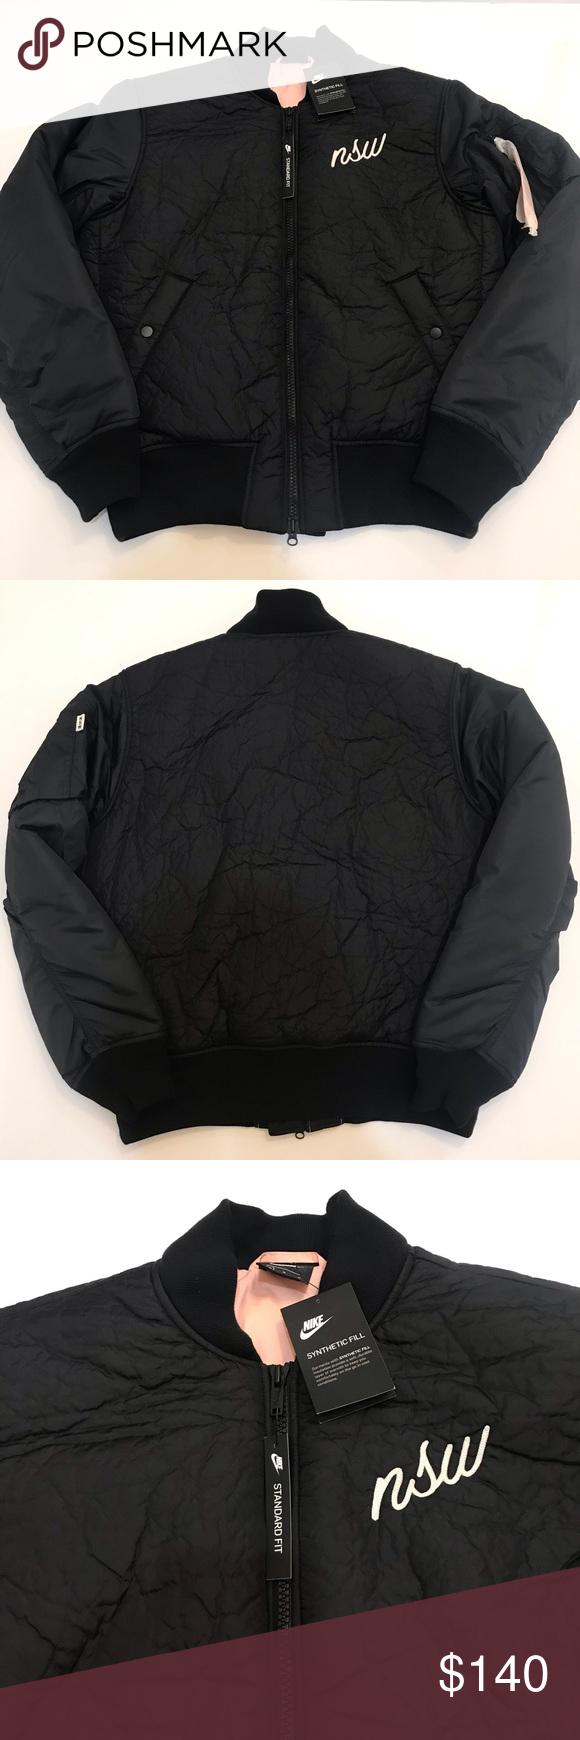 Nike Nsw Synthetic Fill Bomber Jacket Men S Medium New With Tags Nike Nsw Synthetic Fill Bomber Jacket Black With Bomber Jacket Men Bomber Jacket Mens Jackets [ 1740 x 580 Pixel ]